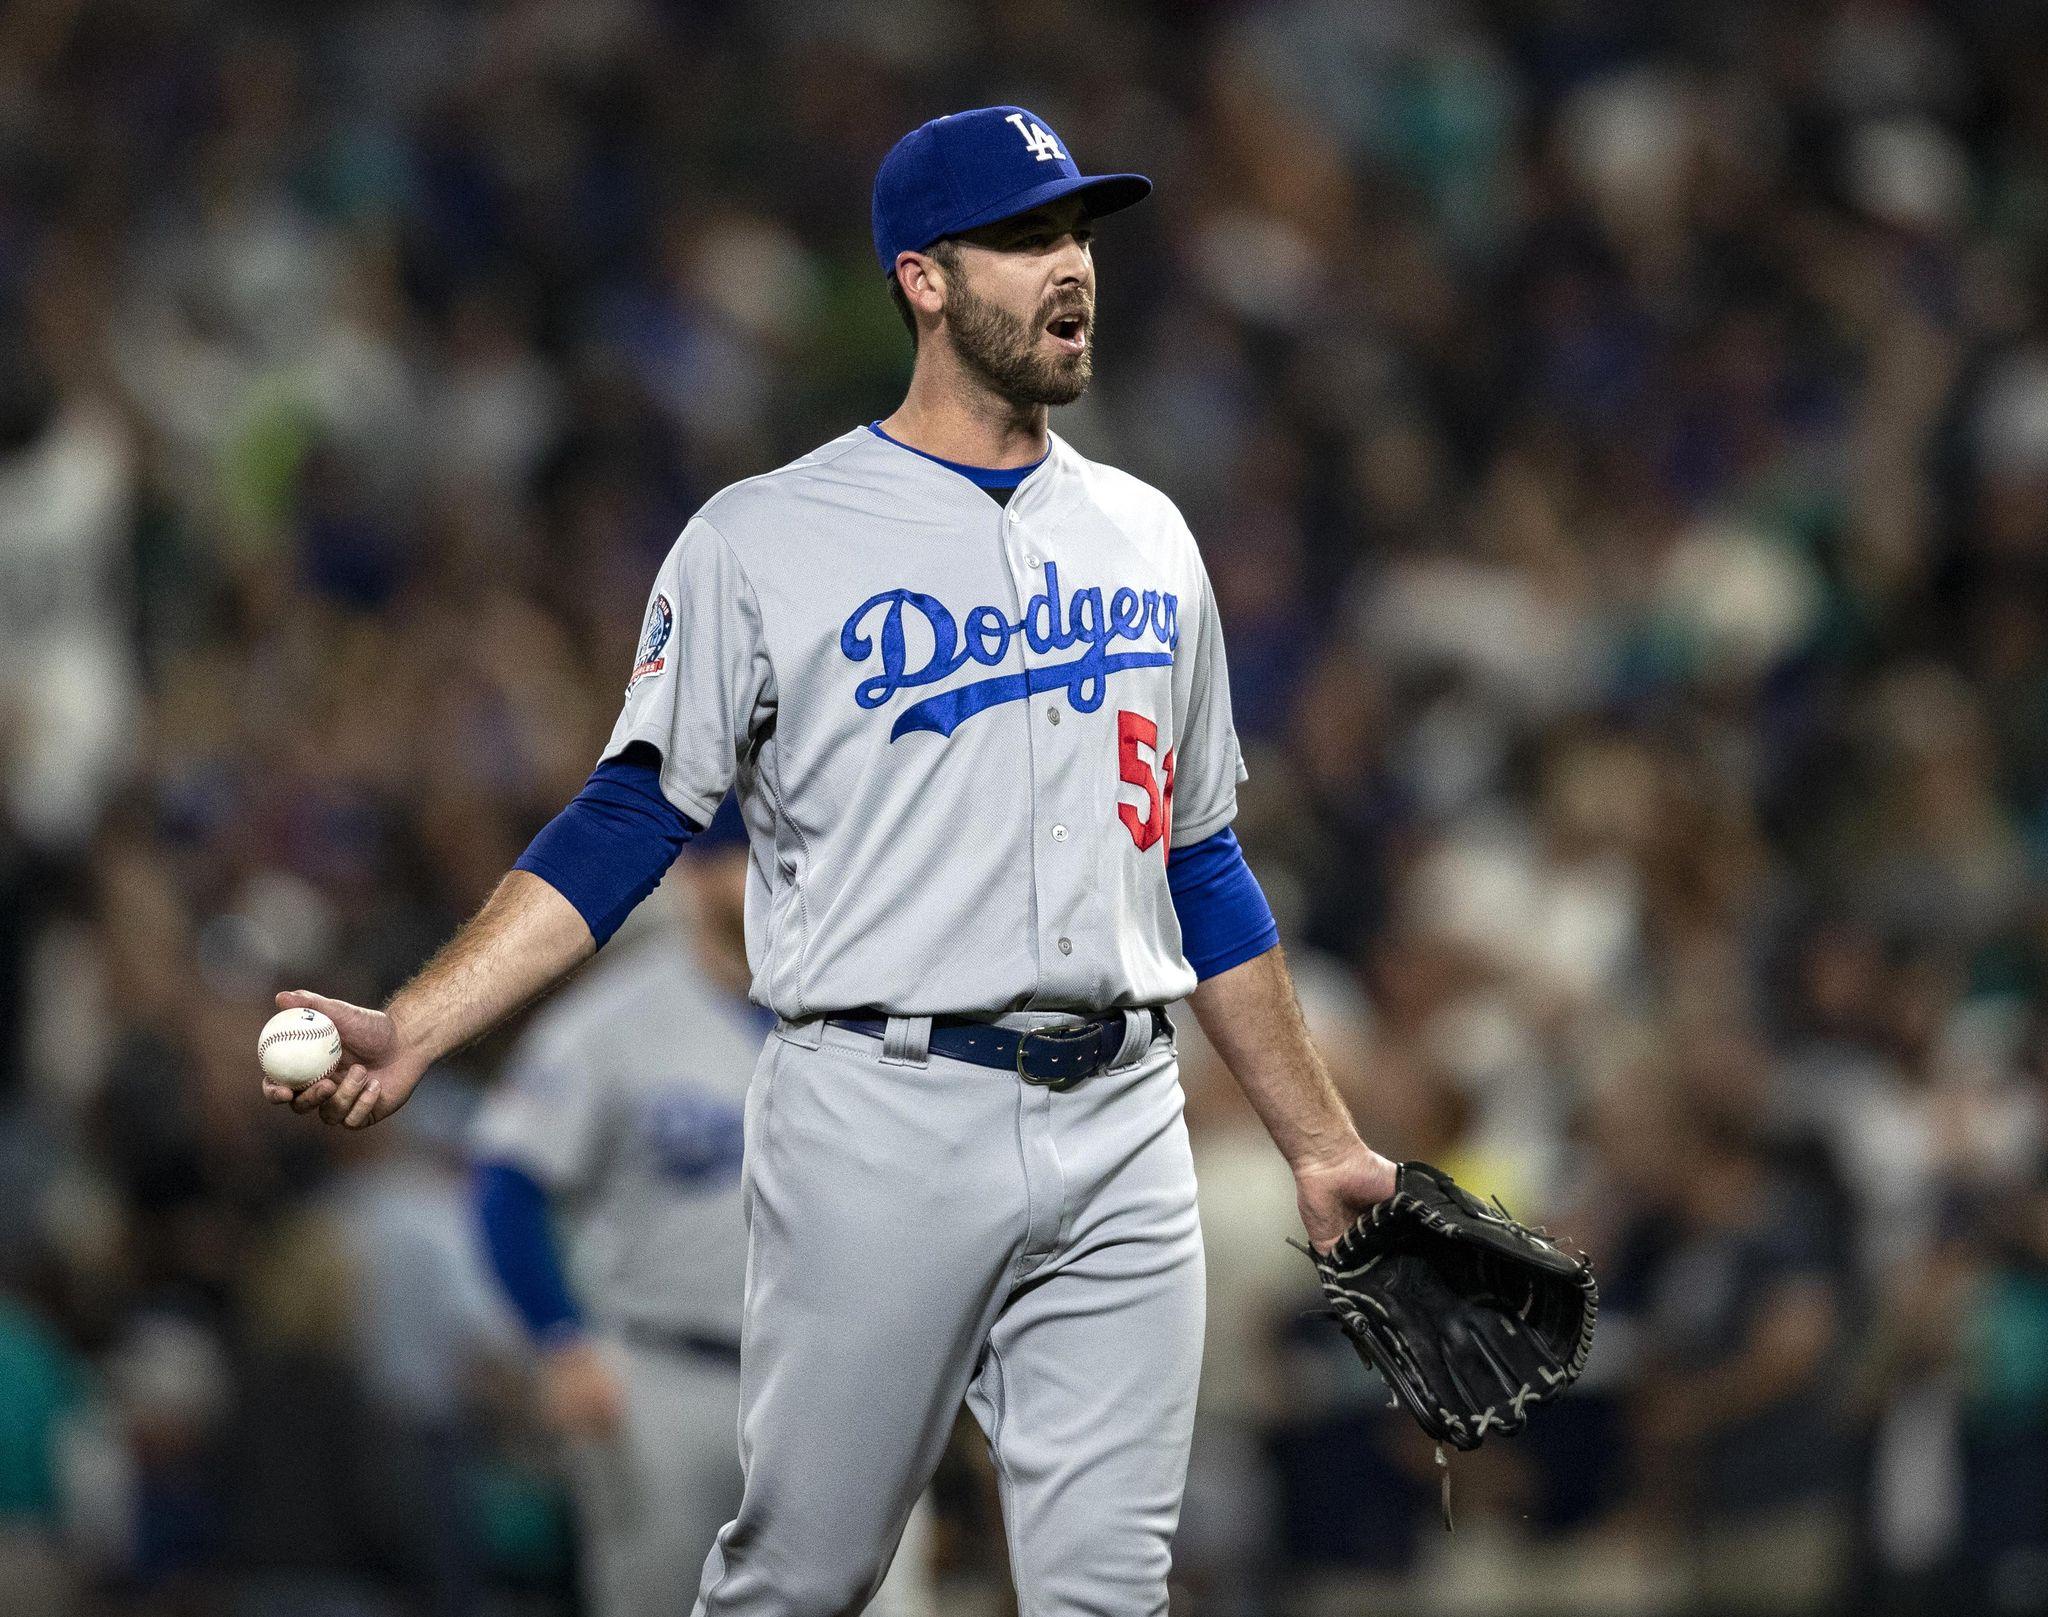 Dodgers_mariners_baseball_39558_s2048x1617